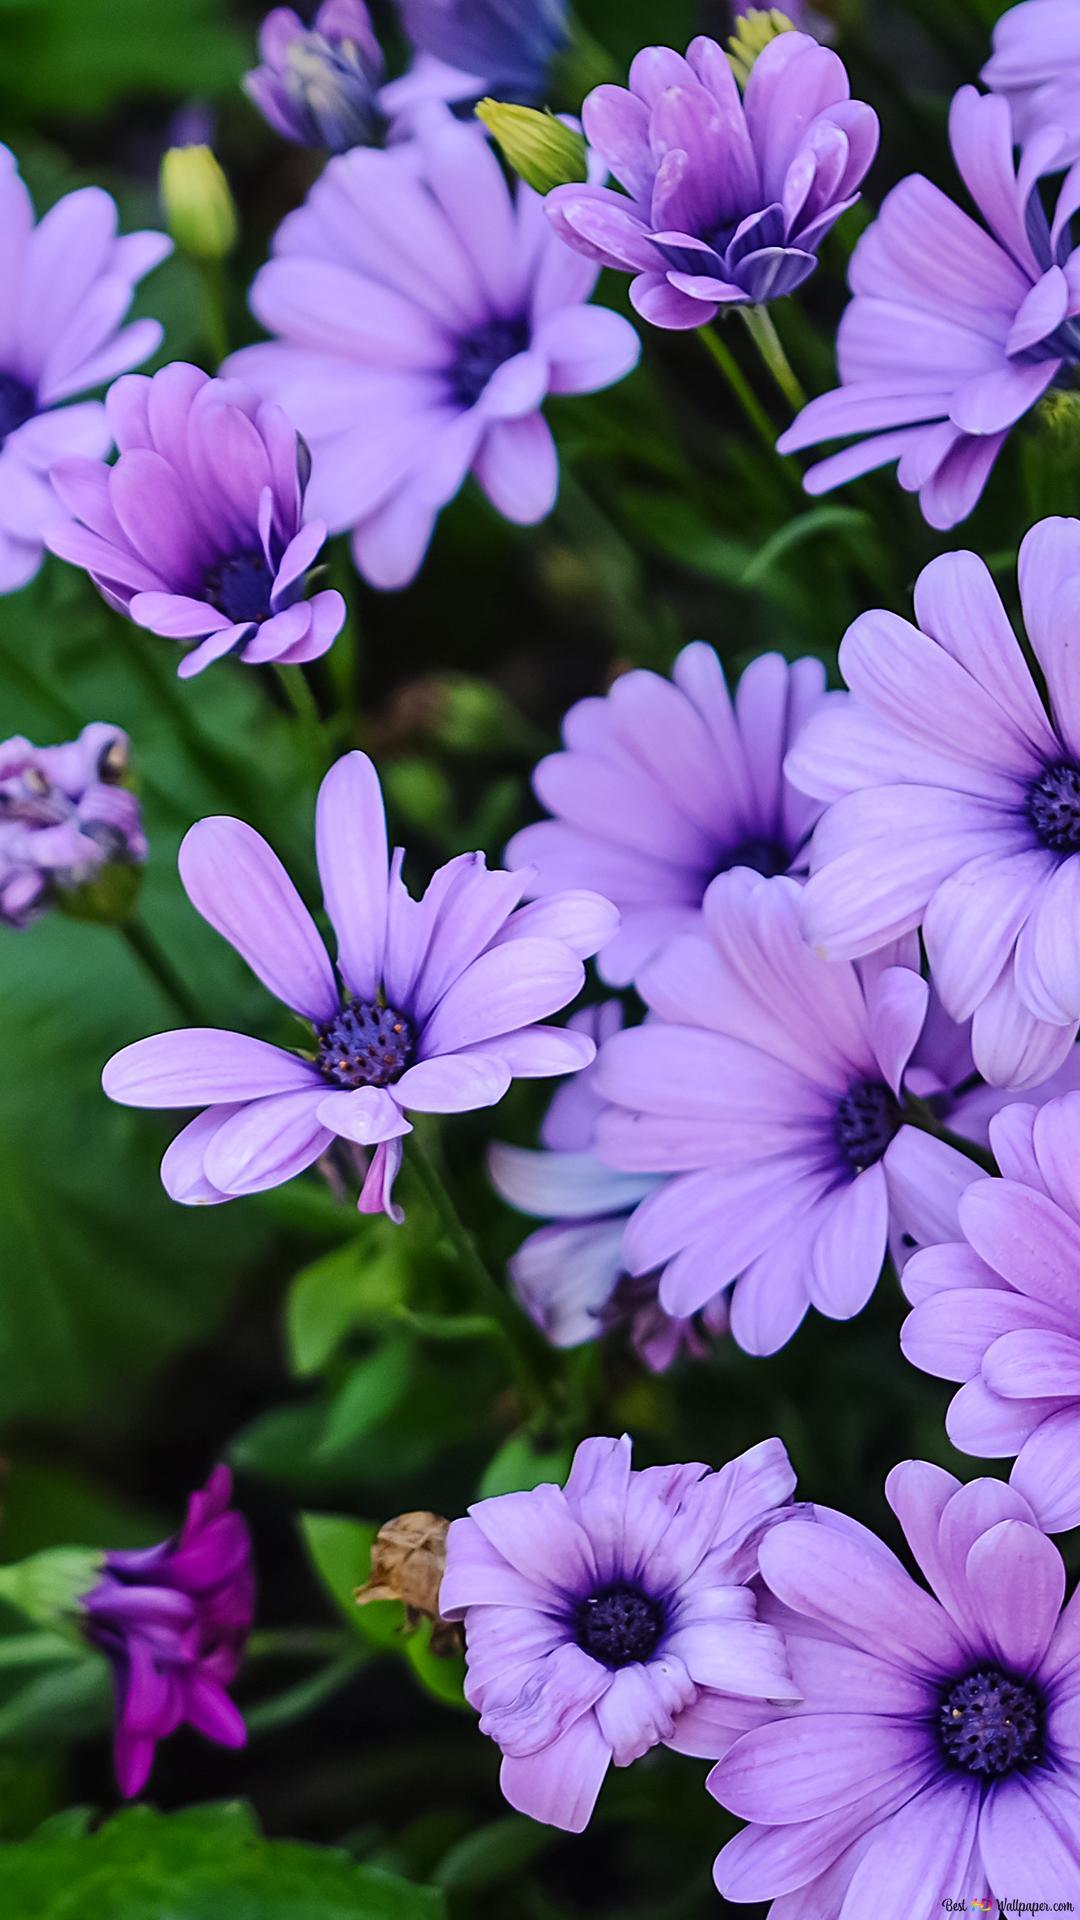 Colorful Beautiful Flowers Hd Wallpaper Download